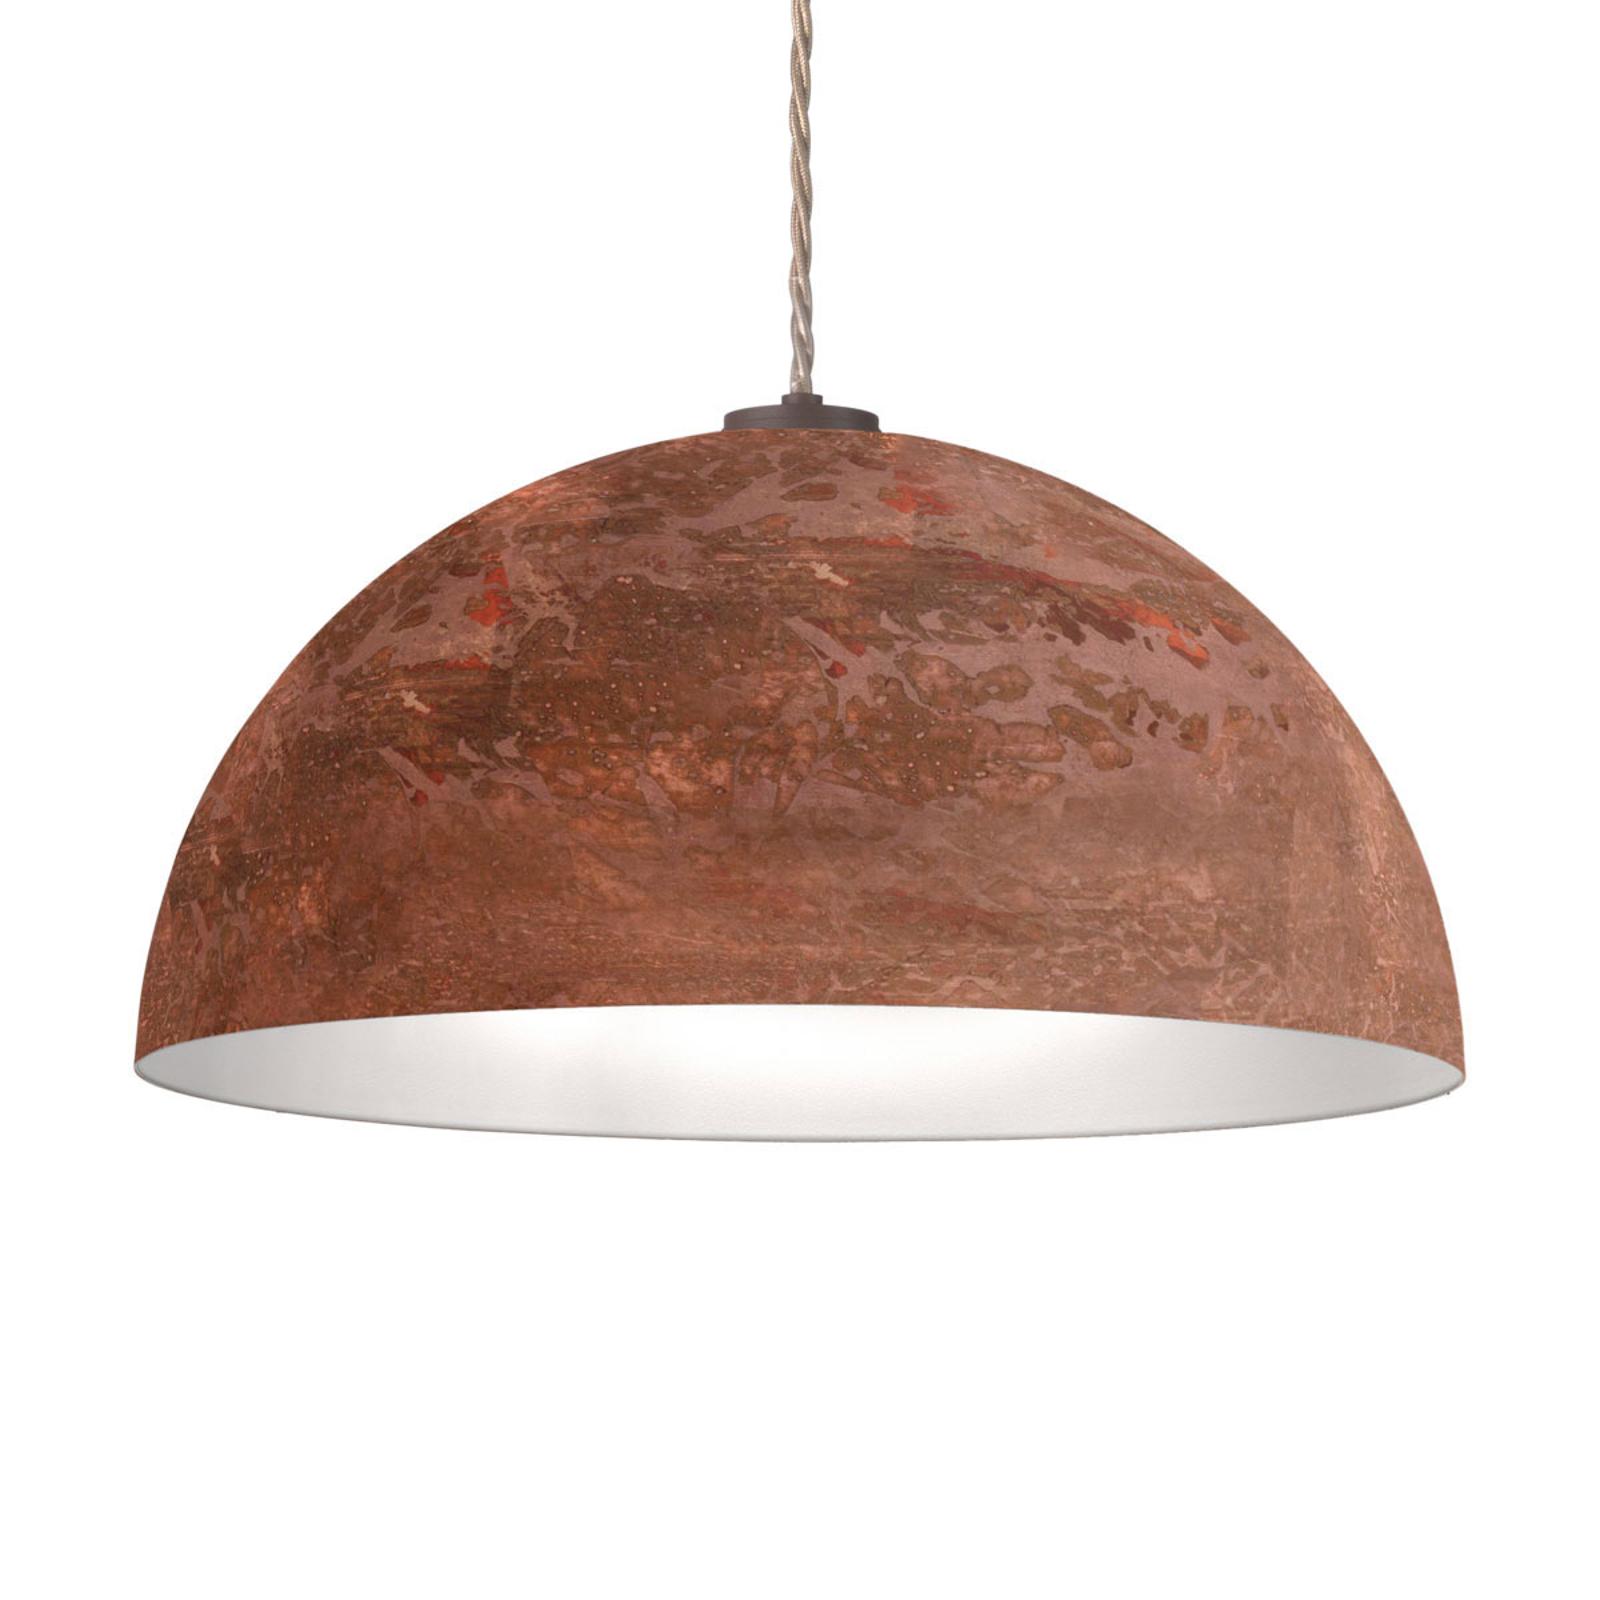 Lampa wisząca Cult Vintage, miedź, Ø 50 cm